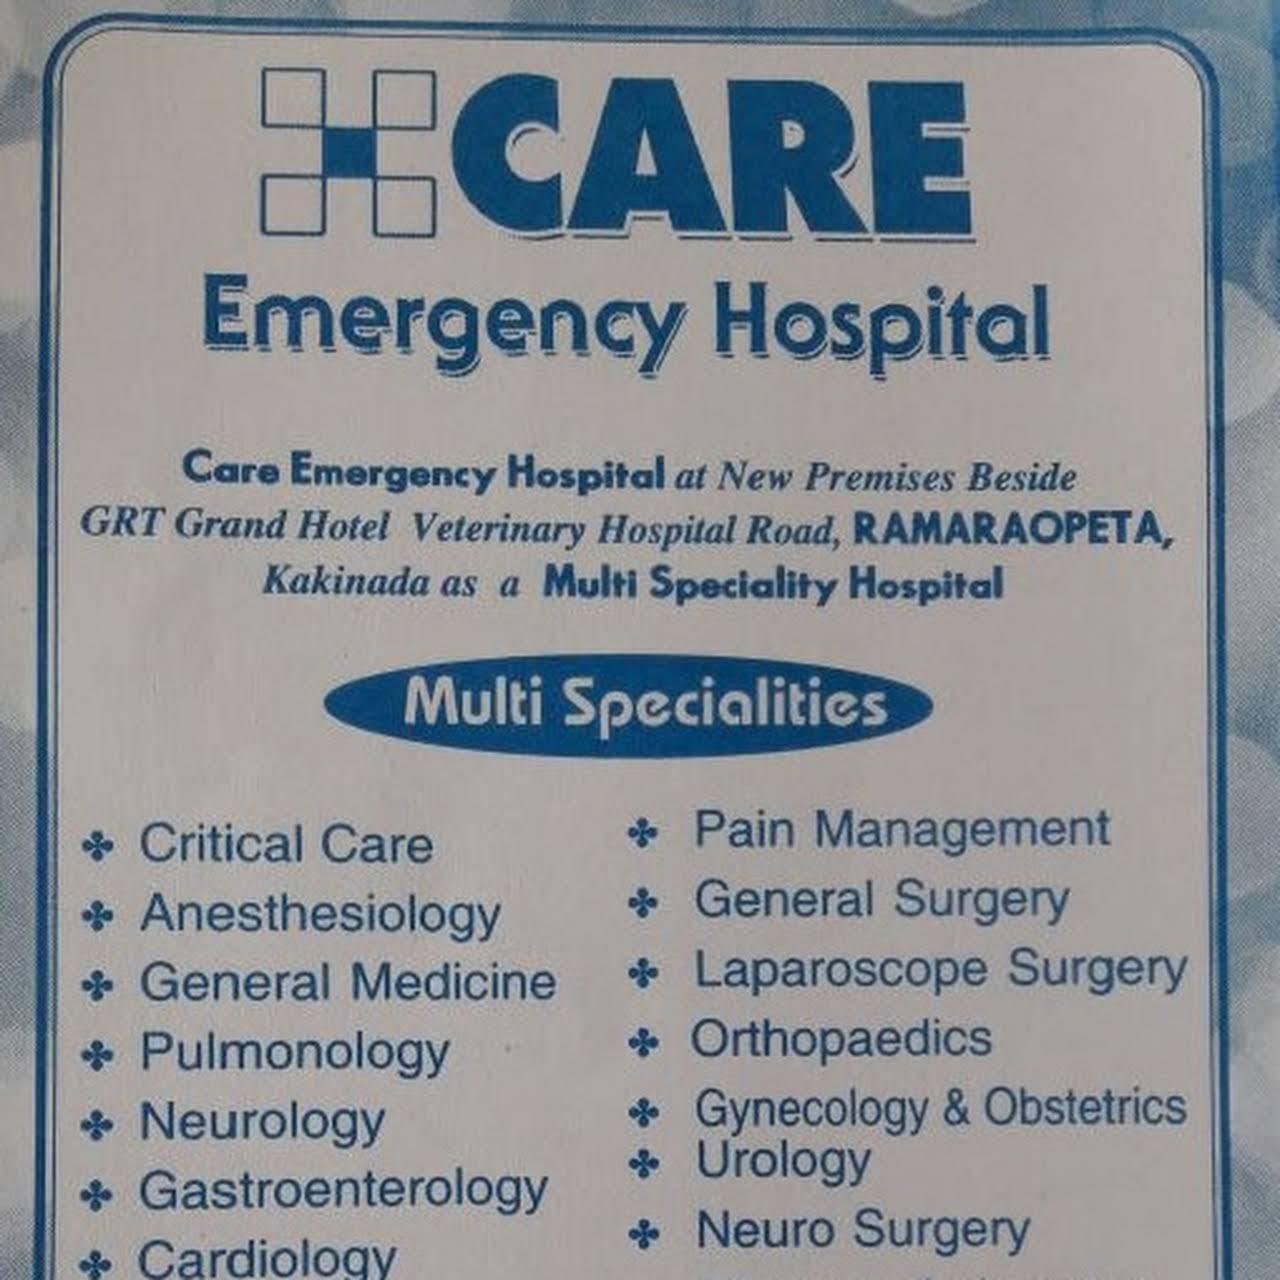 Care Emergency Hospital - Multi Specialty Hospital in Kakinada